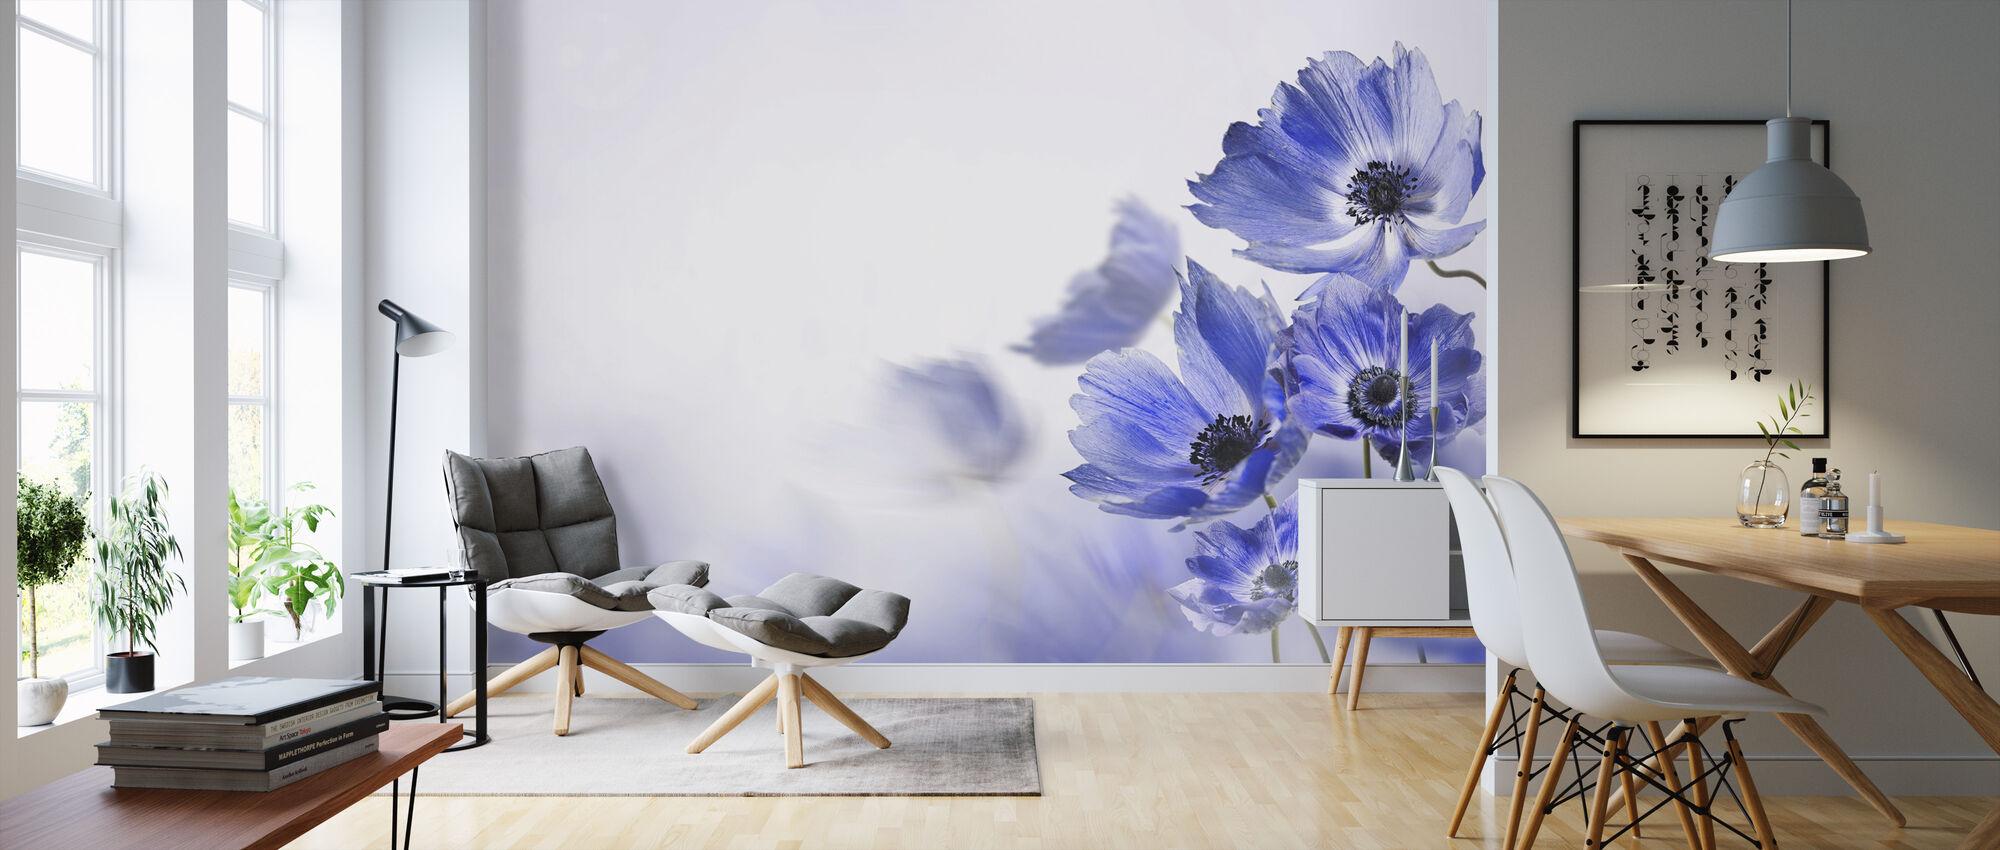 Gloaming Blue Flowers - Wallpaper - Living Room